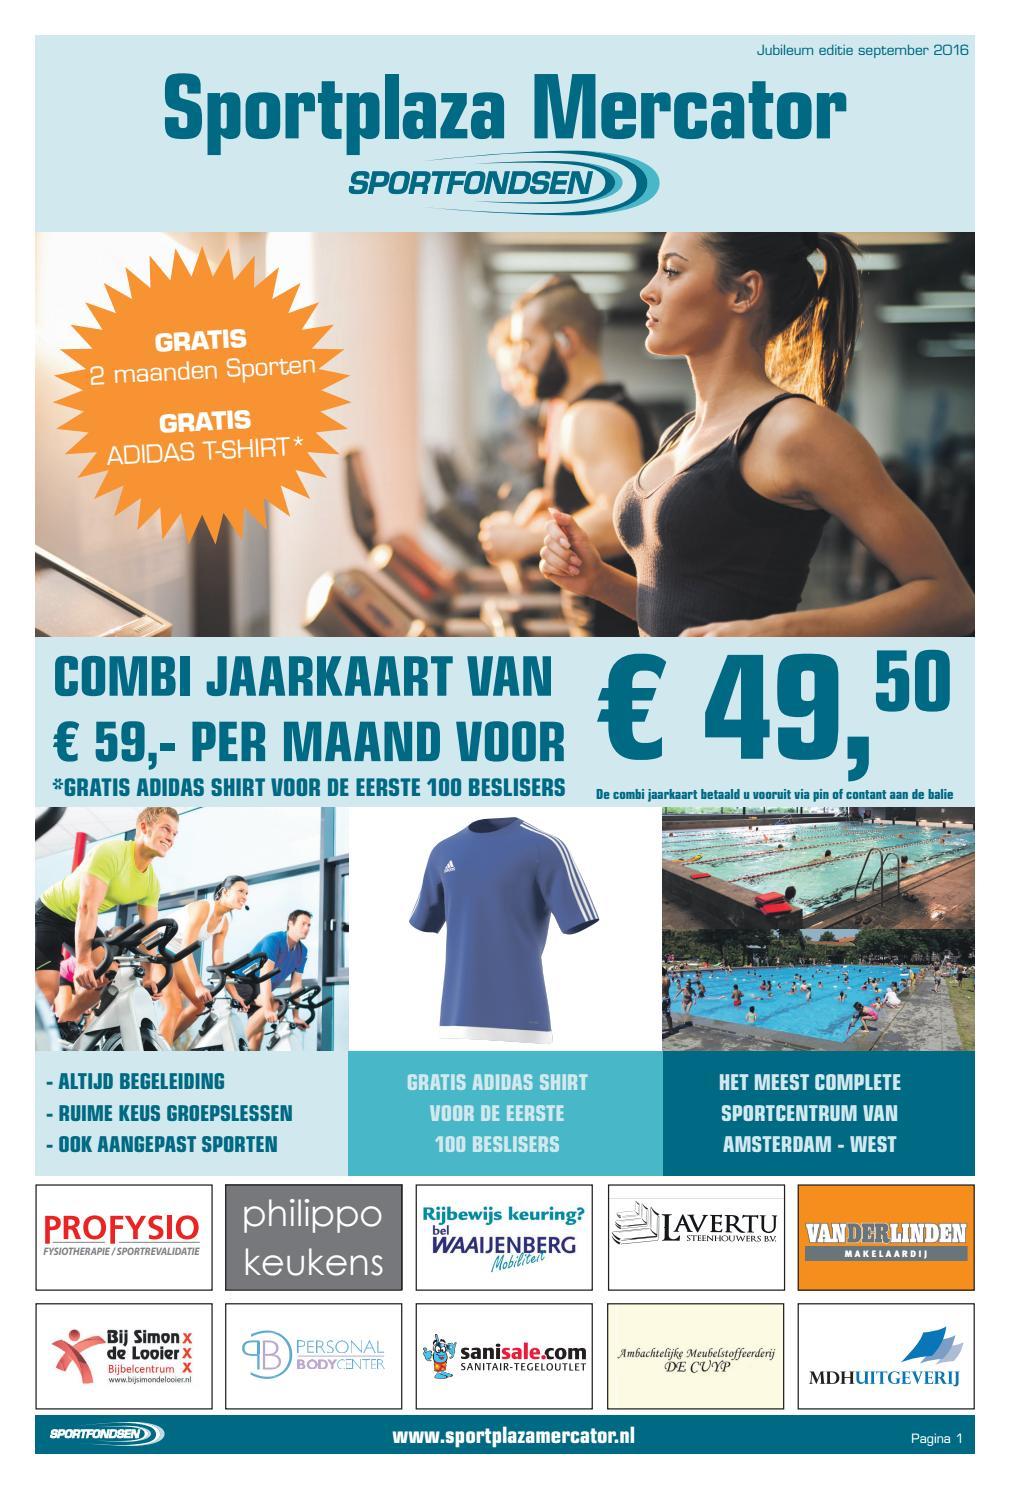 Sportpalza Mercator By Mdh Uitgeverij Issuu